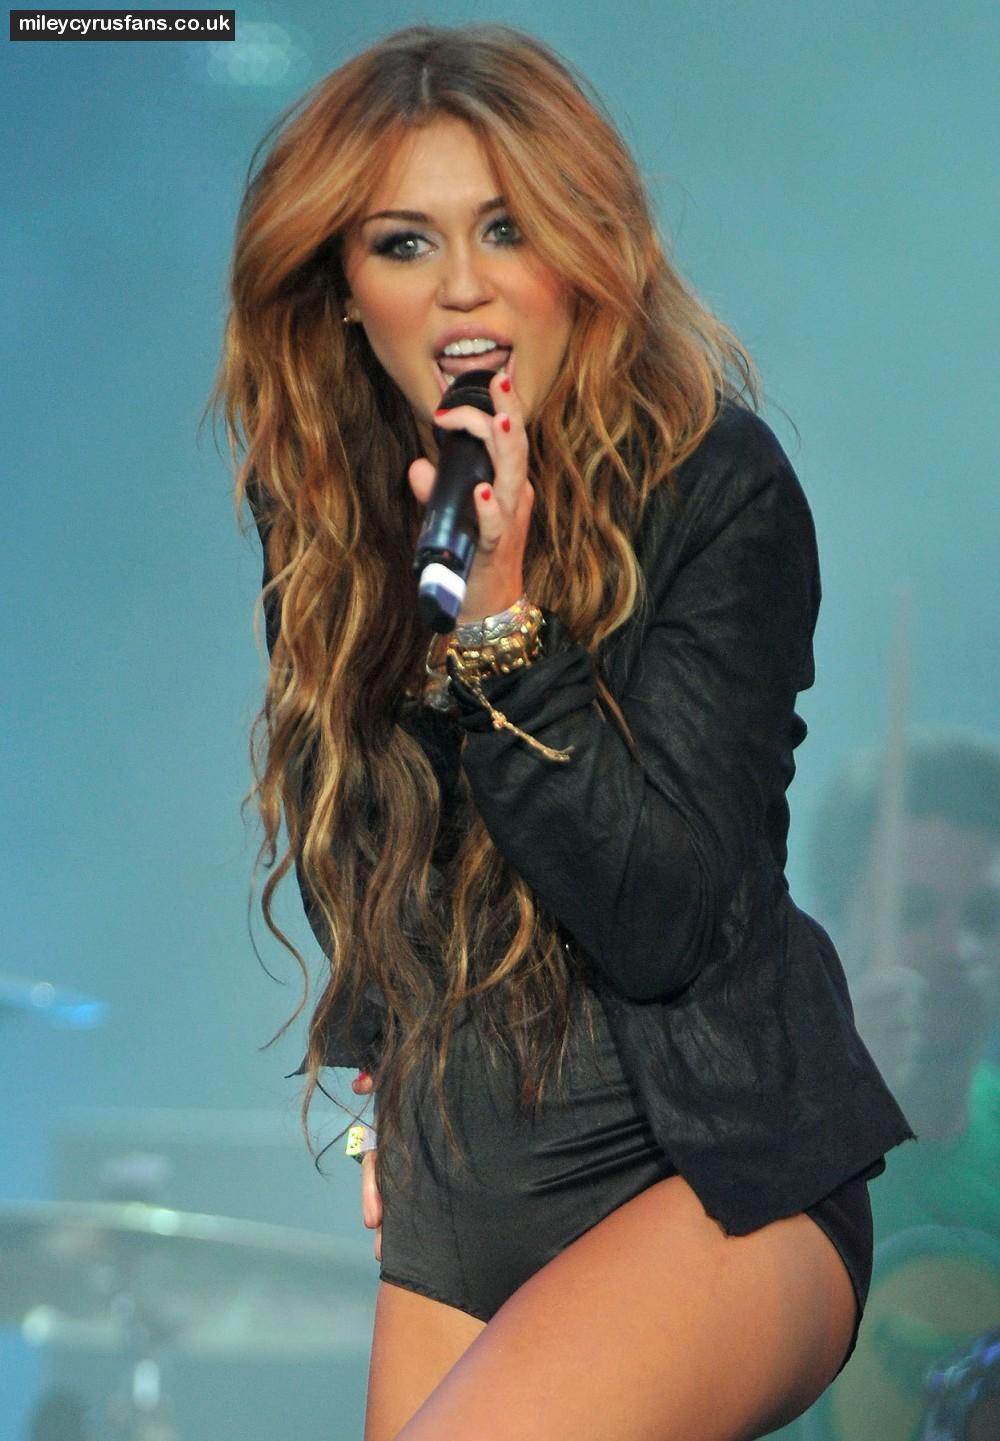 Tylerandkenzie Miley Cyrus Hot-4061